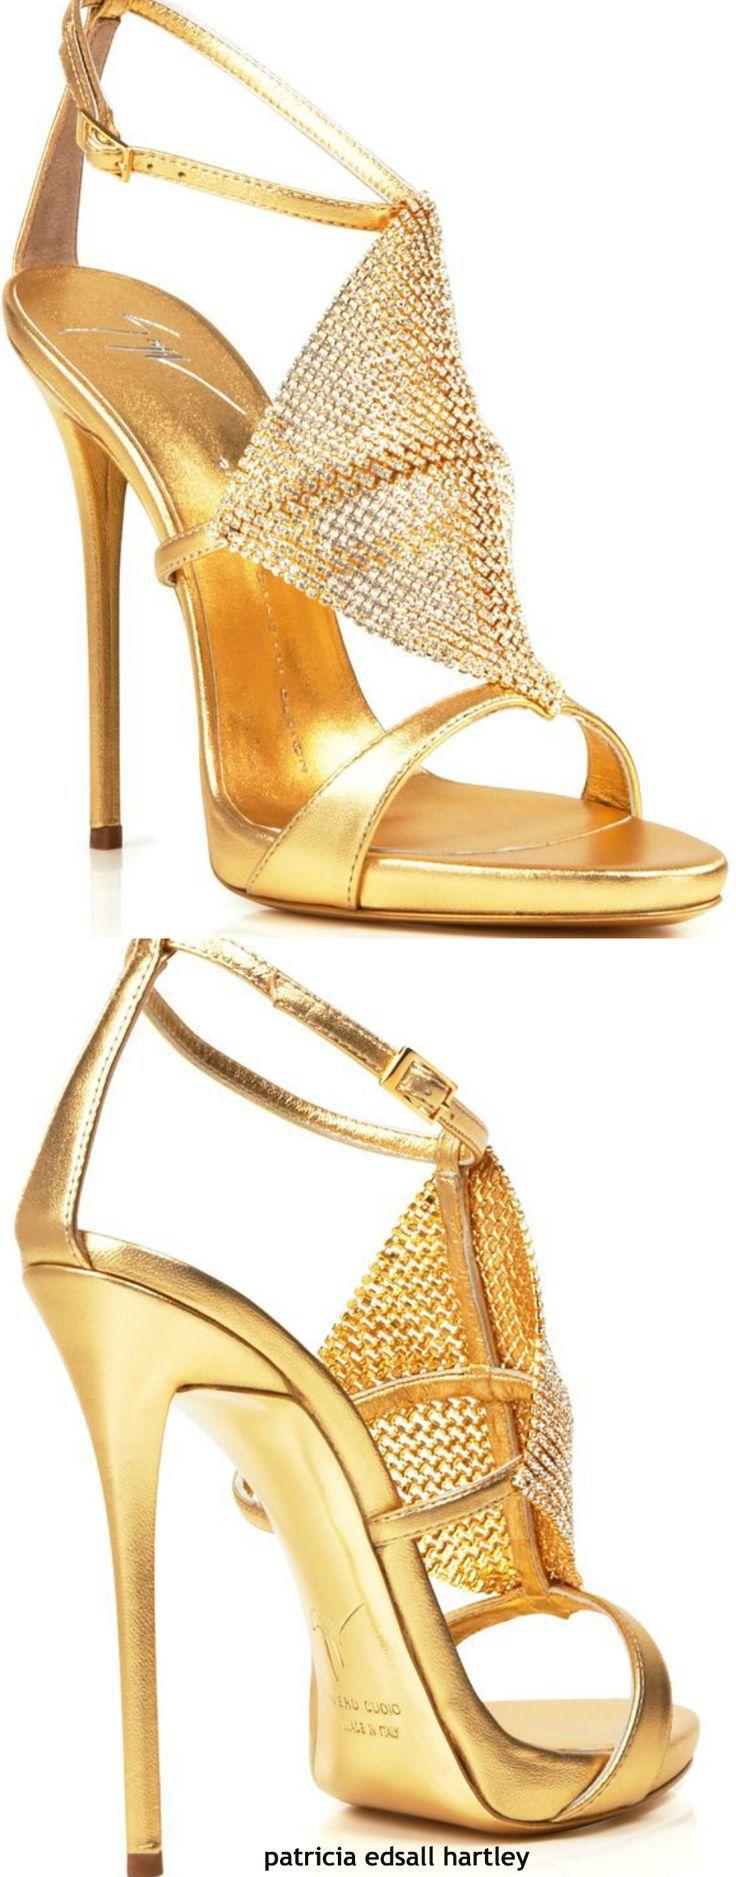 gold step...Heel | Shoes | Pinterest | Heels, Kind of and Gold heels